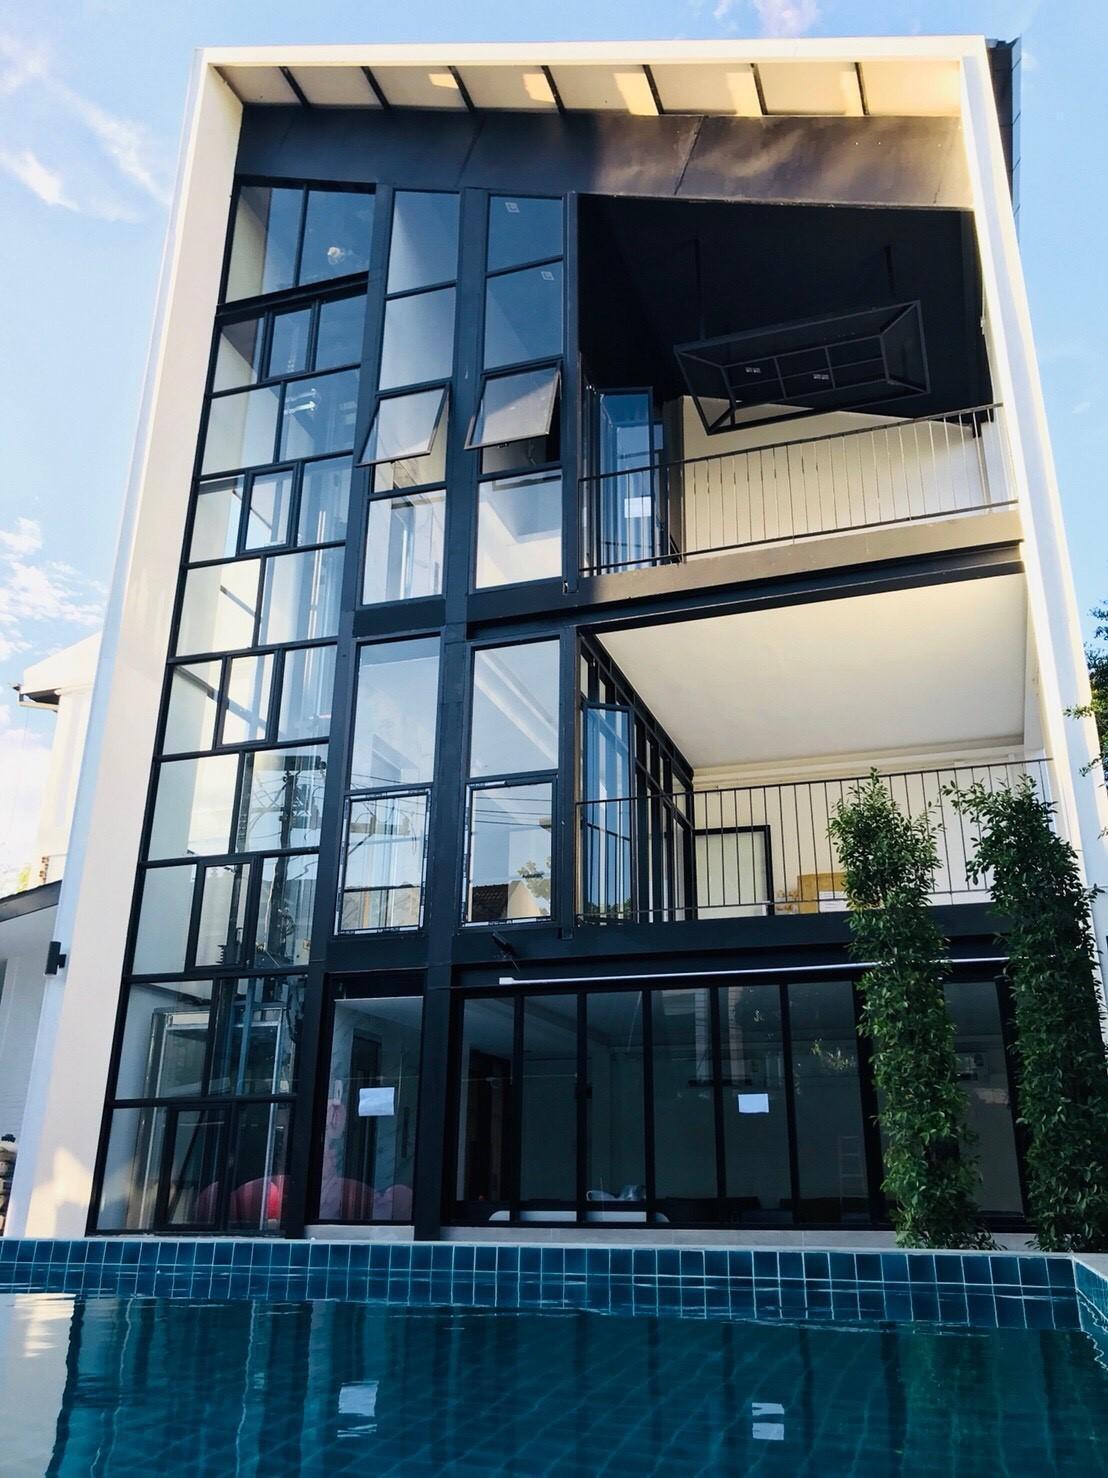 The Nimman Apartment  NT20 อพาร์ตเมนต์ 1 ห้องนอน 1 ห้องน้ำส่วนตัว ขนาด 22 ตร.ม. – นิมมานเหมินทร์